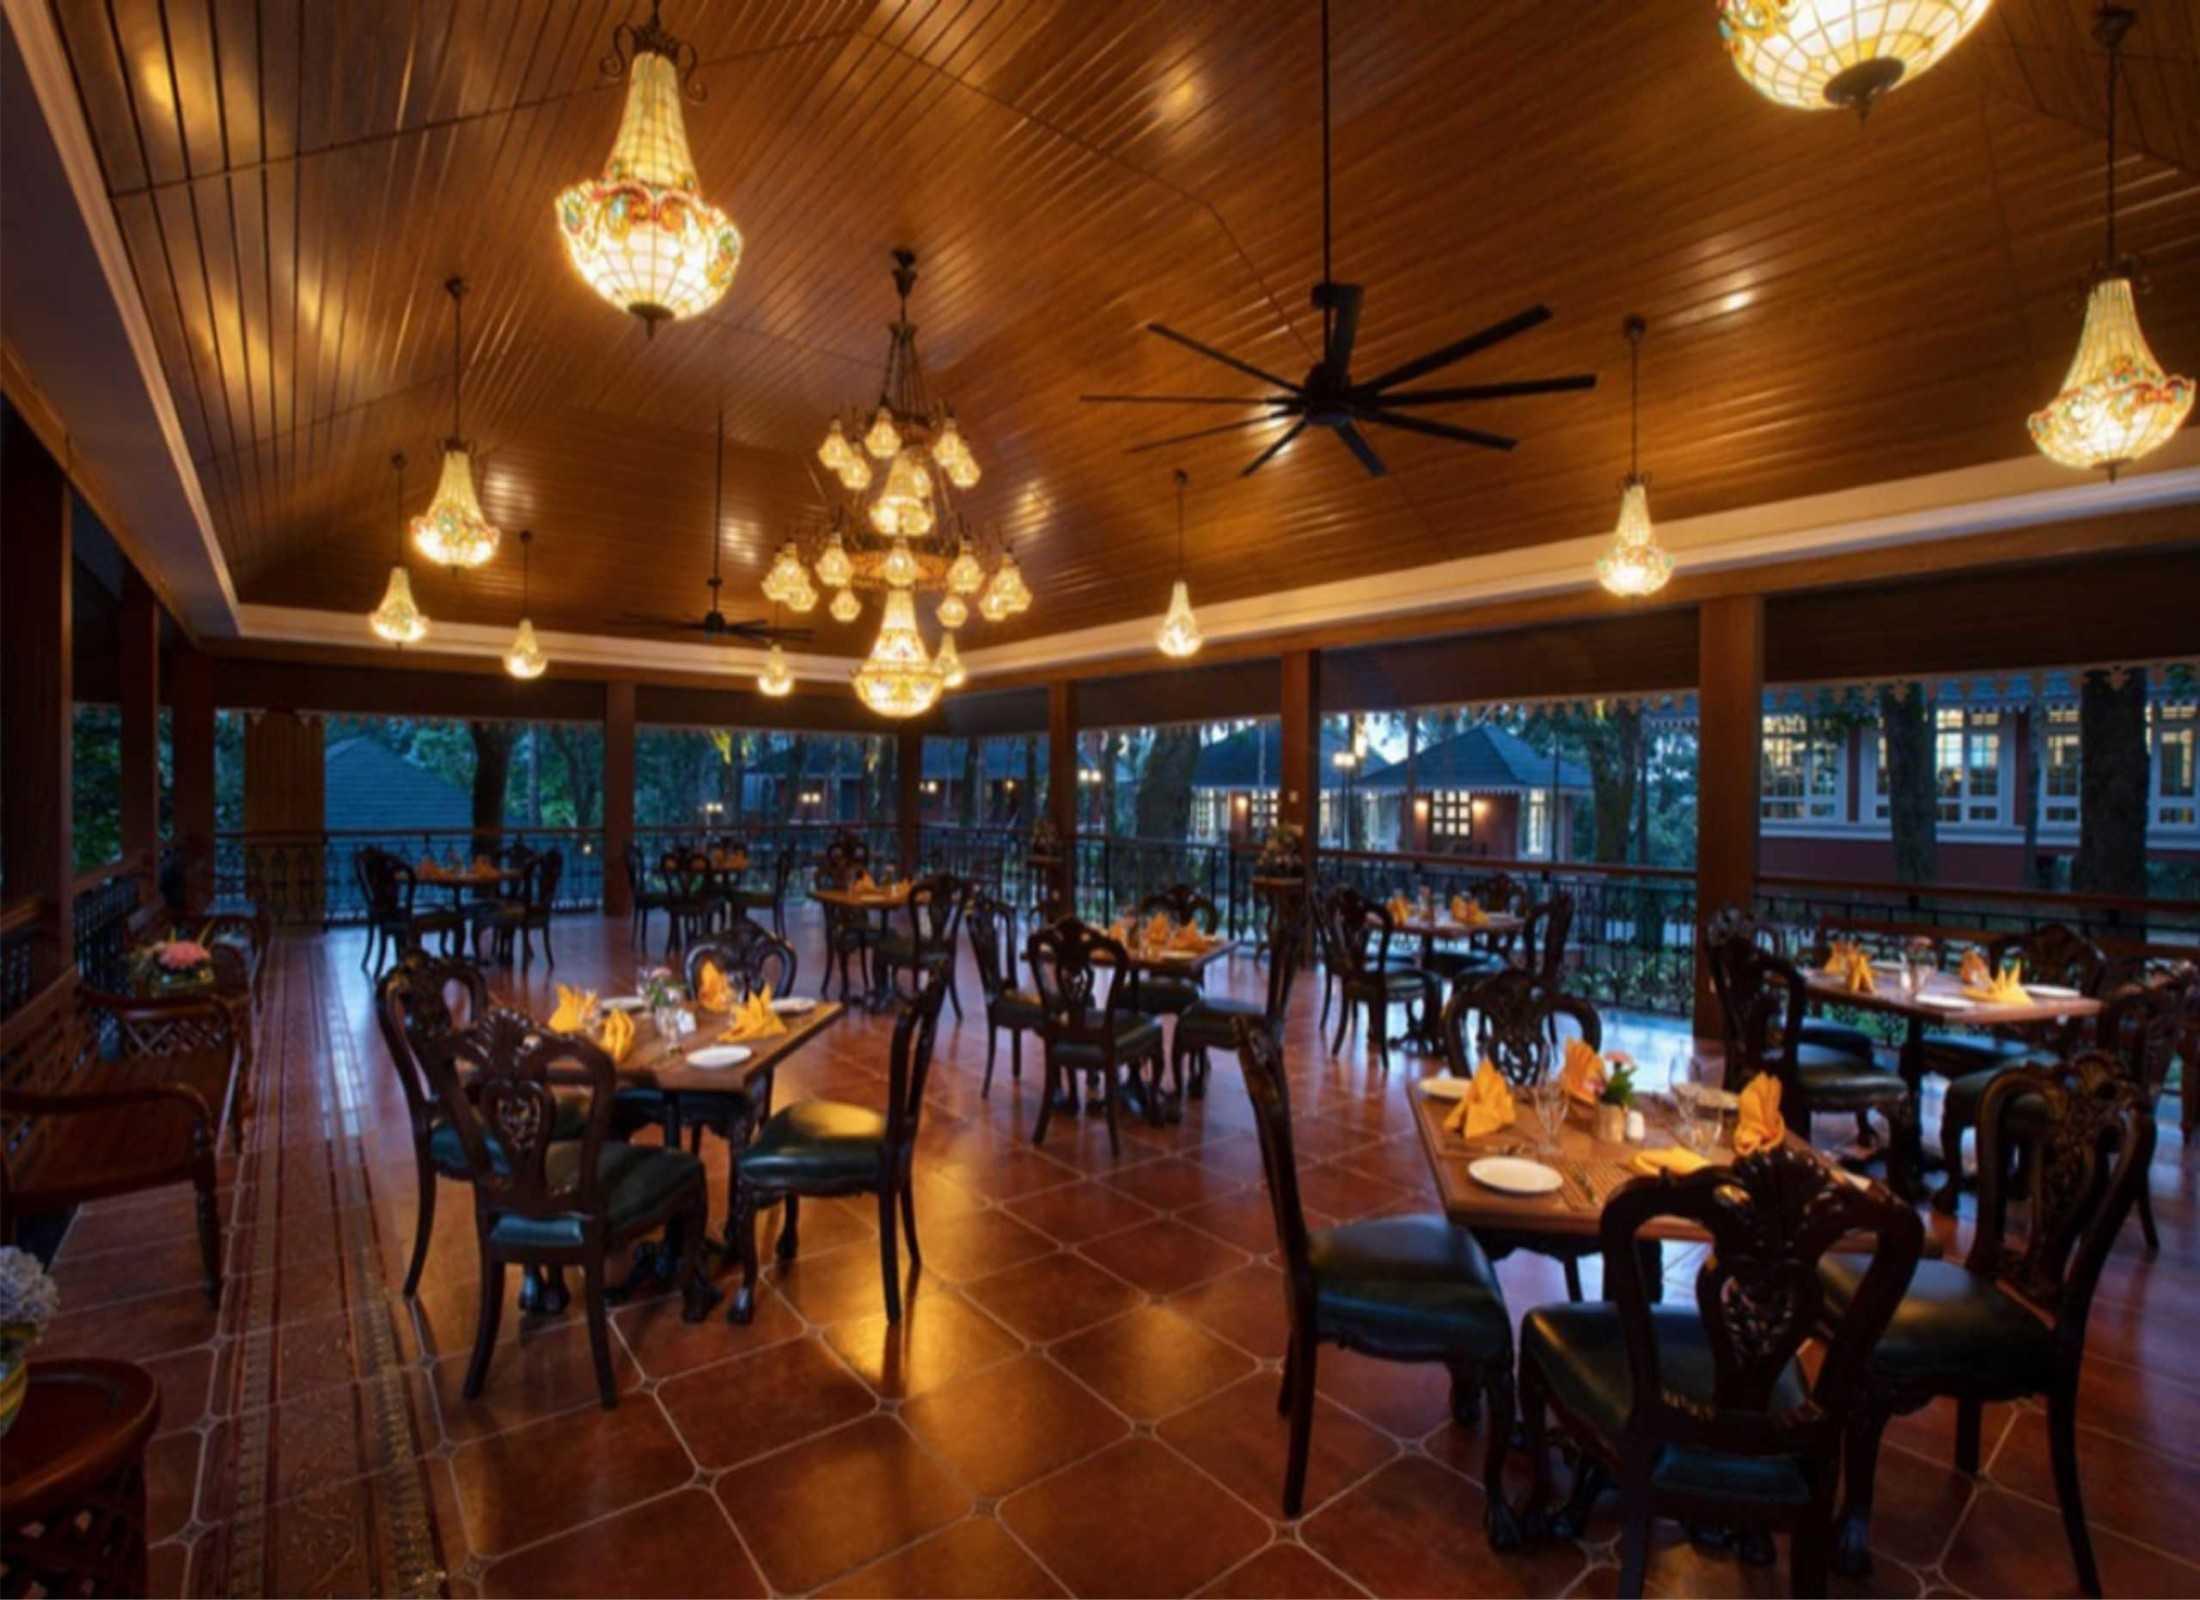 Rekai Design Interior Coorg Wilderness Resort, Coorg-India Virajpet, Main, Mysore - Madikeri Rd, Madikeri, Karnataka 571201, India Virajpet, Main, Mysore - Madikeri Rd, Madikeri, Karnataka 571201, India Rekai-Design-Interior-Coorg-Wilderness-Resort-Coorg-India  113303